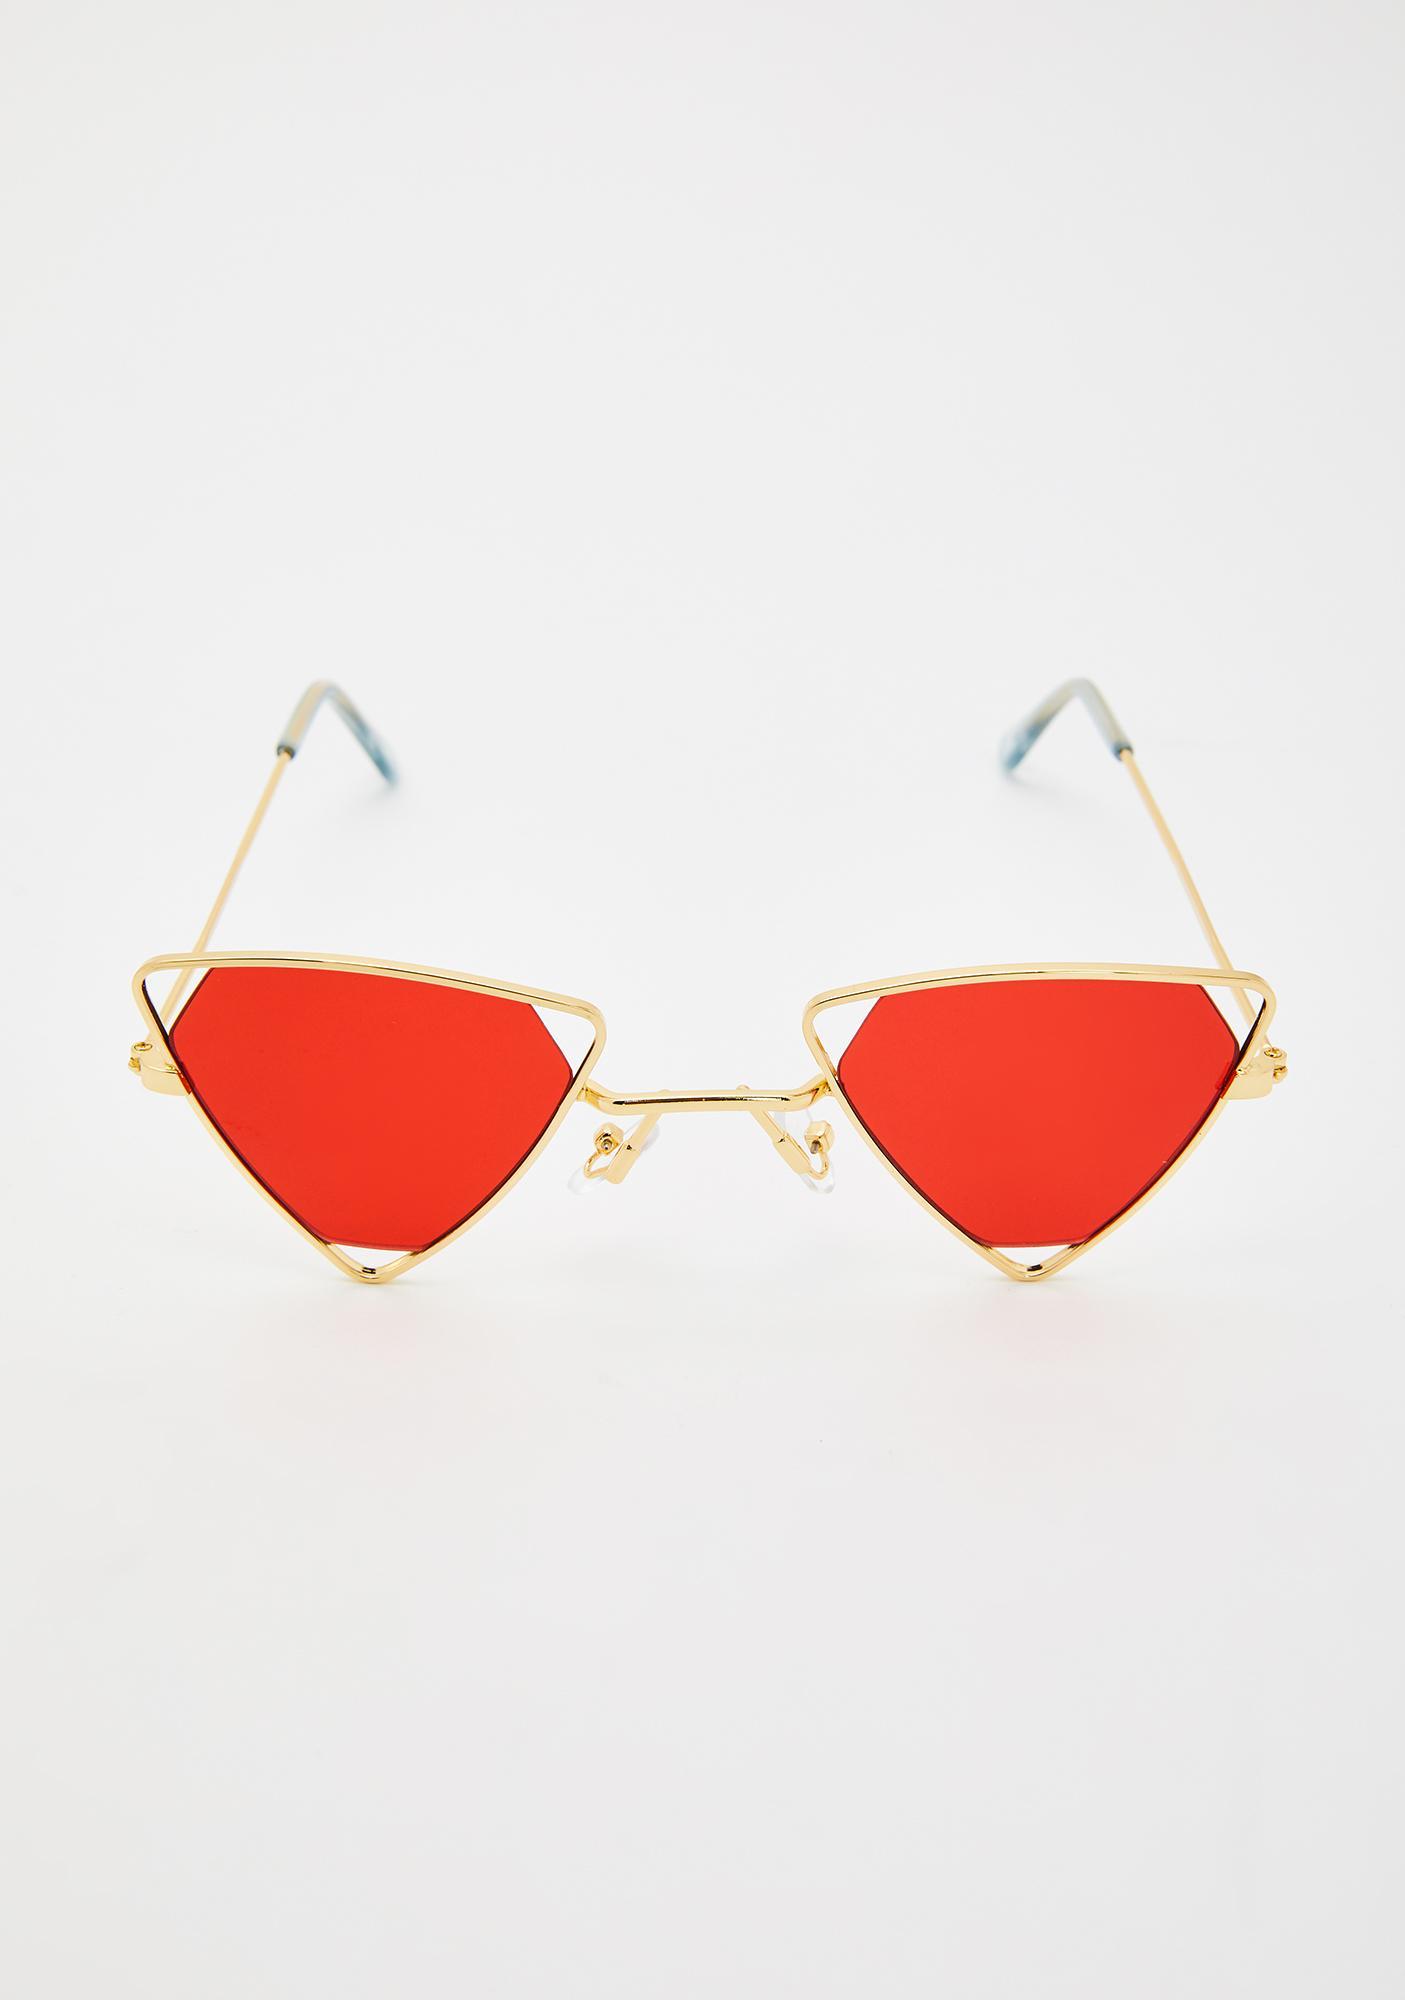 Lit Broke Bish Triangle Sunglasses